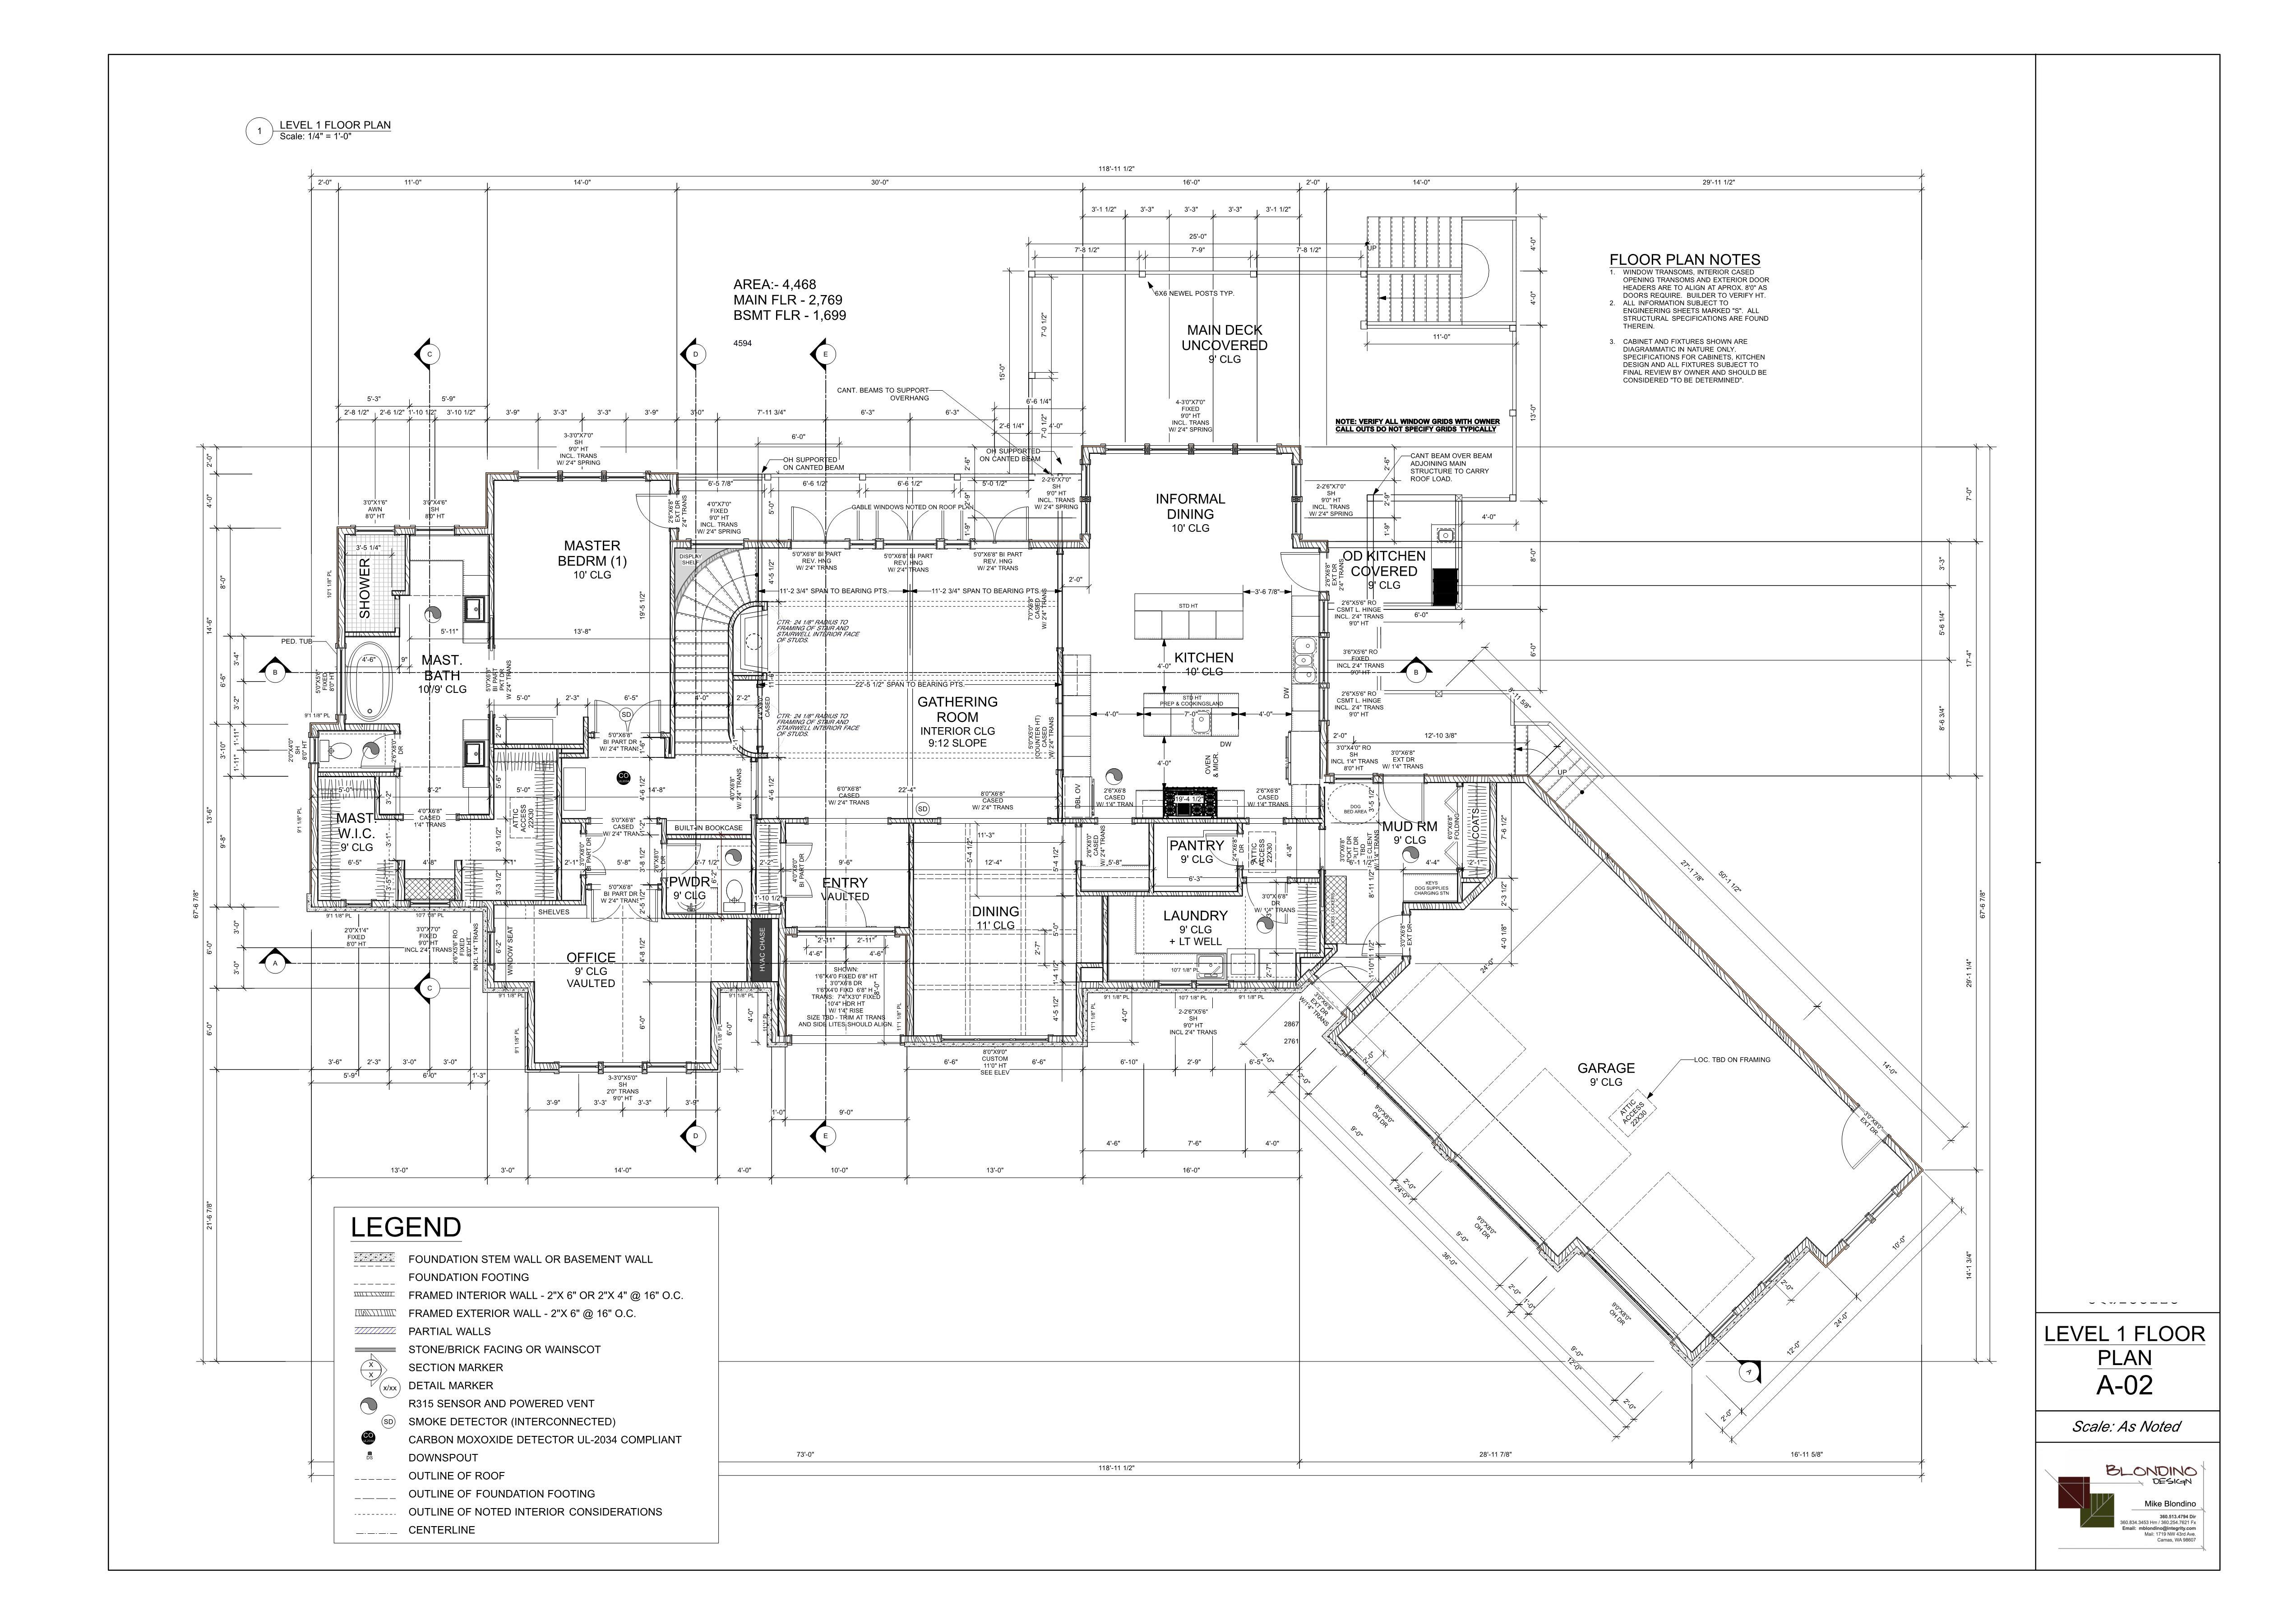 Final design main level floorplan